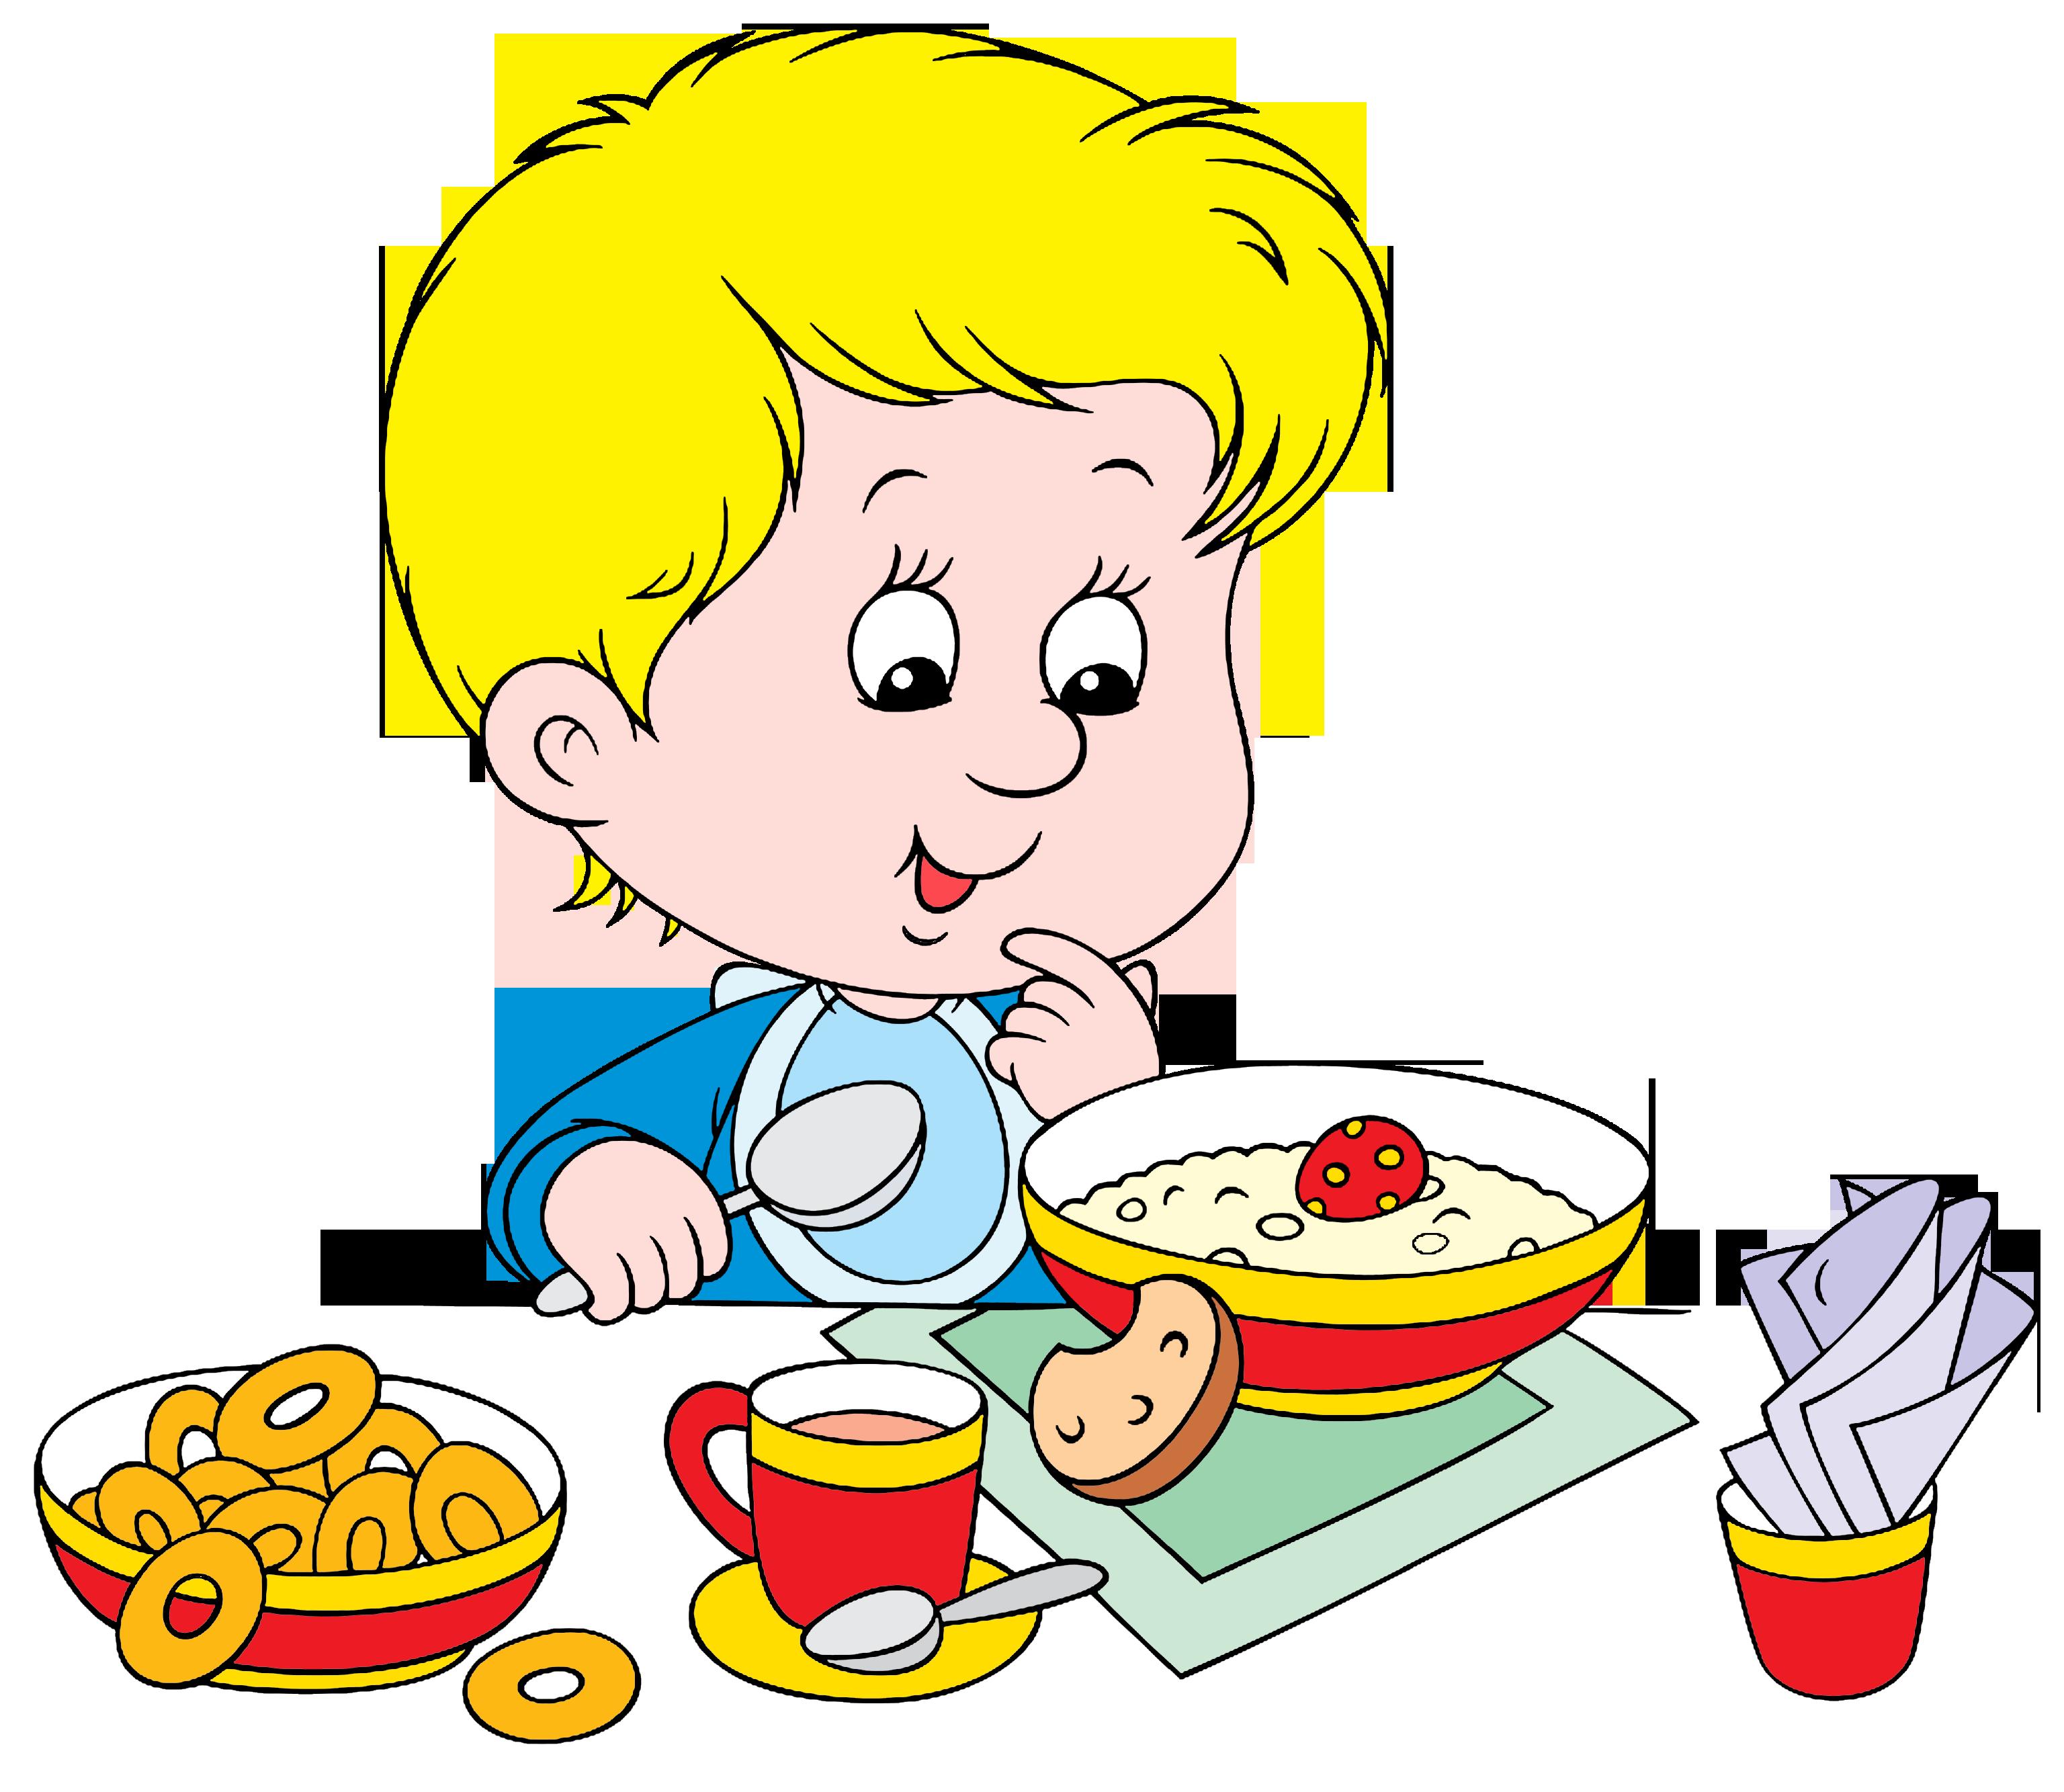 Feeding fish clipart graphic freeuse boy eating breakfast clipart - Google Търсене | Klipart | Pinterest graphic freeuse